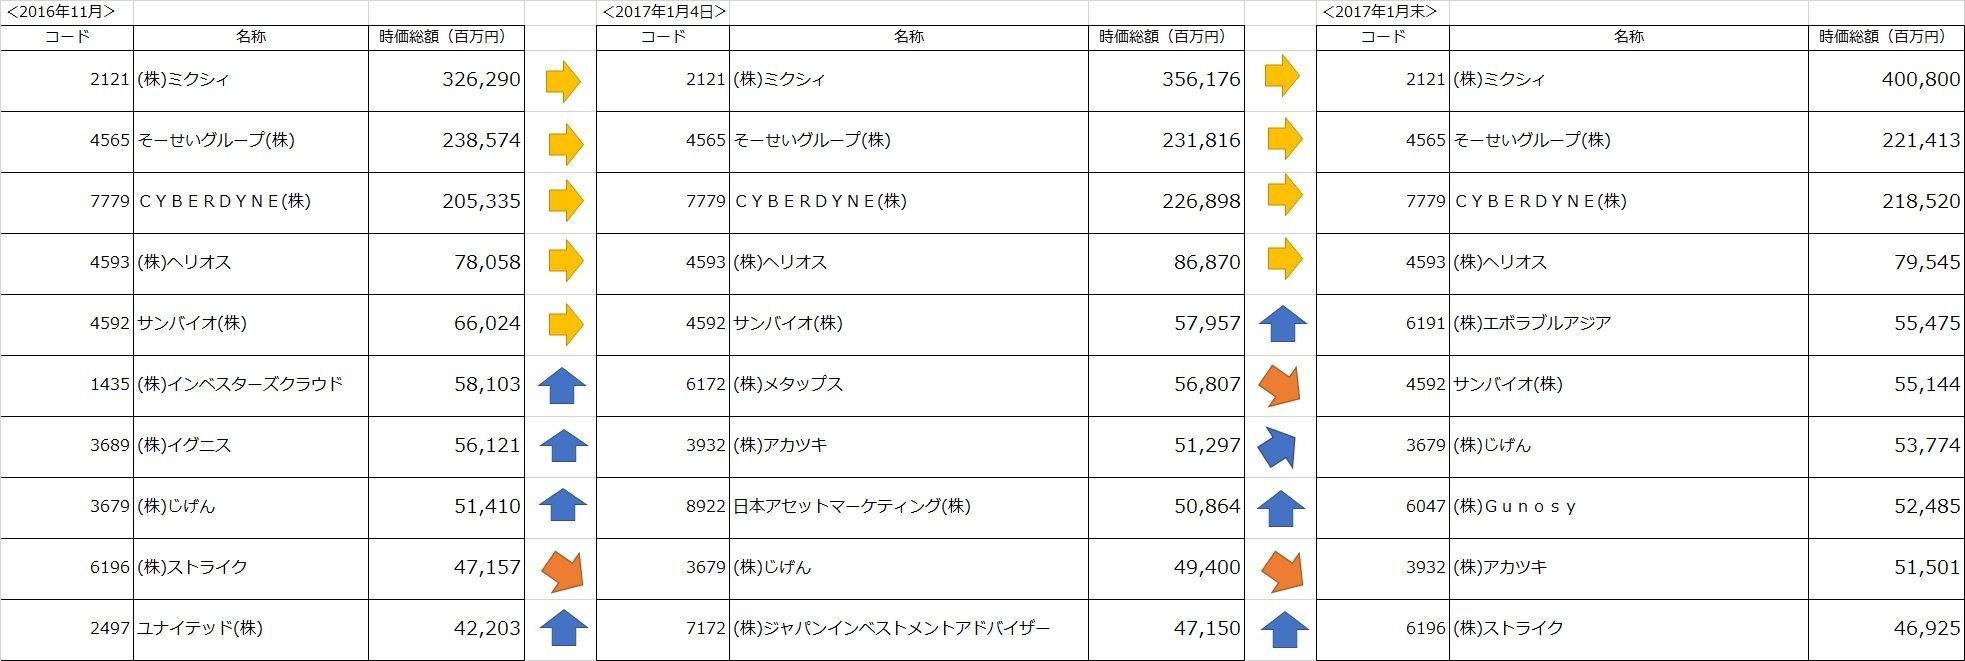 Similar to (page 4) - Japanese...